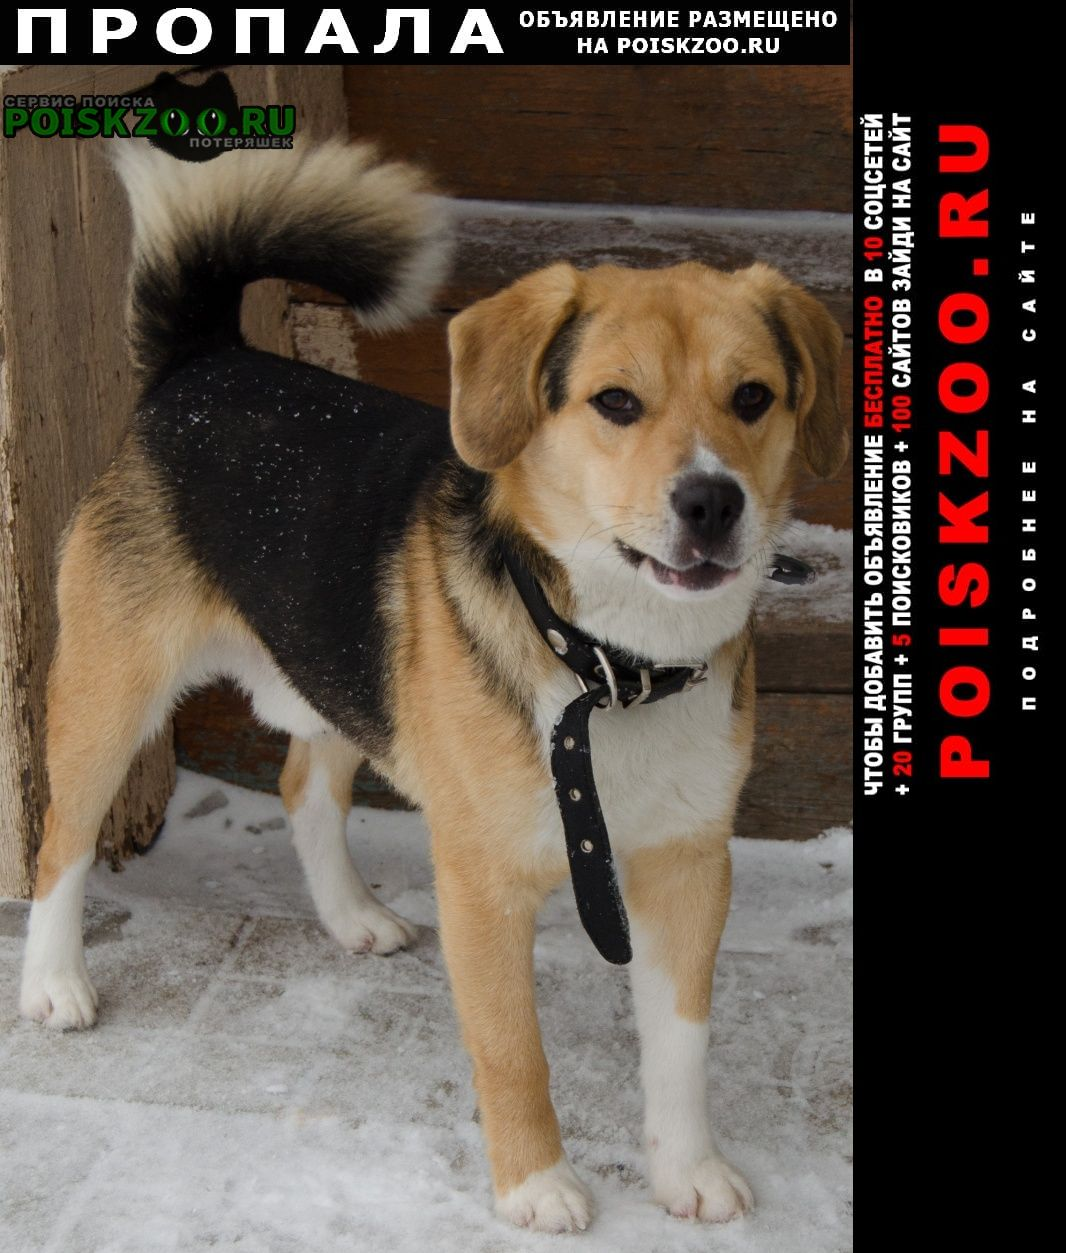 Пропала собака кобель любимая собака.бигль.кличка лаки Пенза